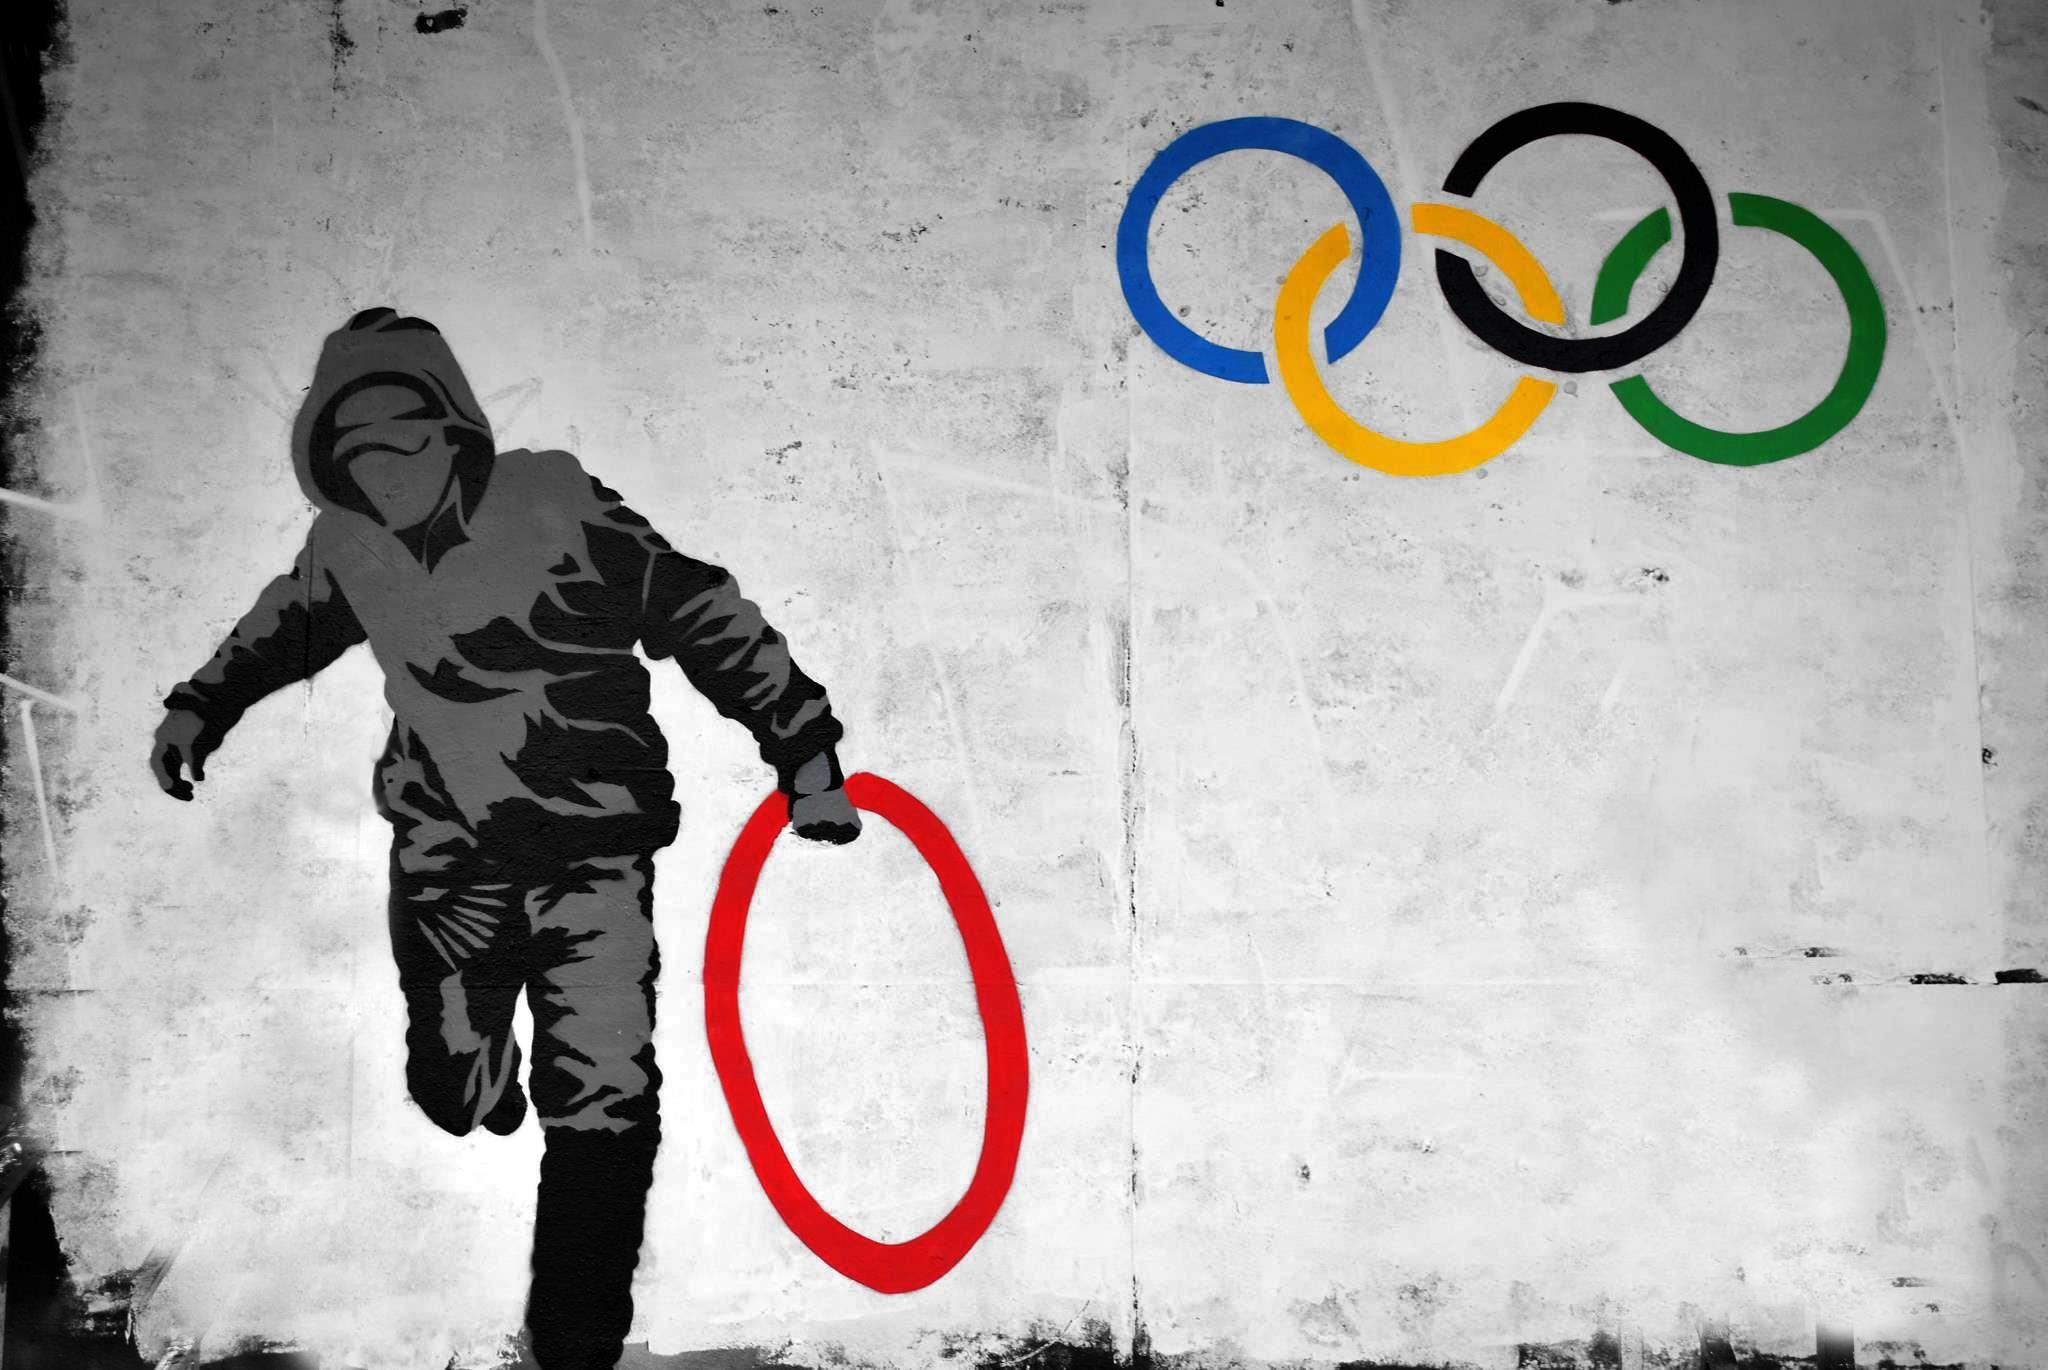 Olympics street art